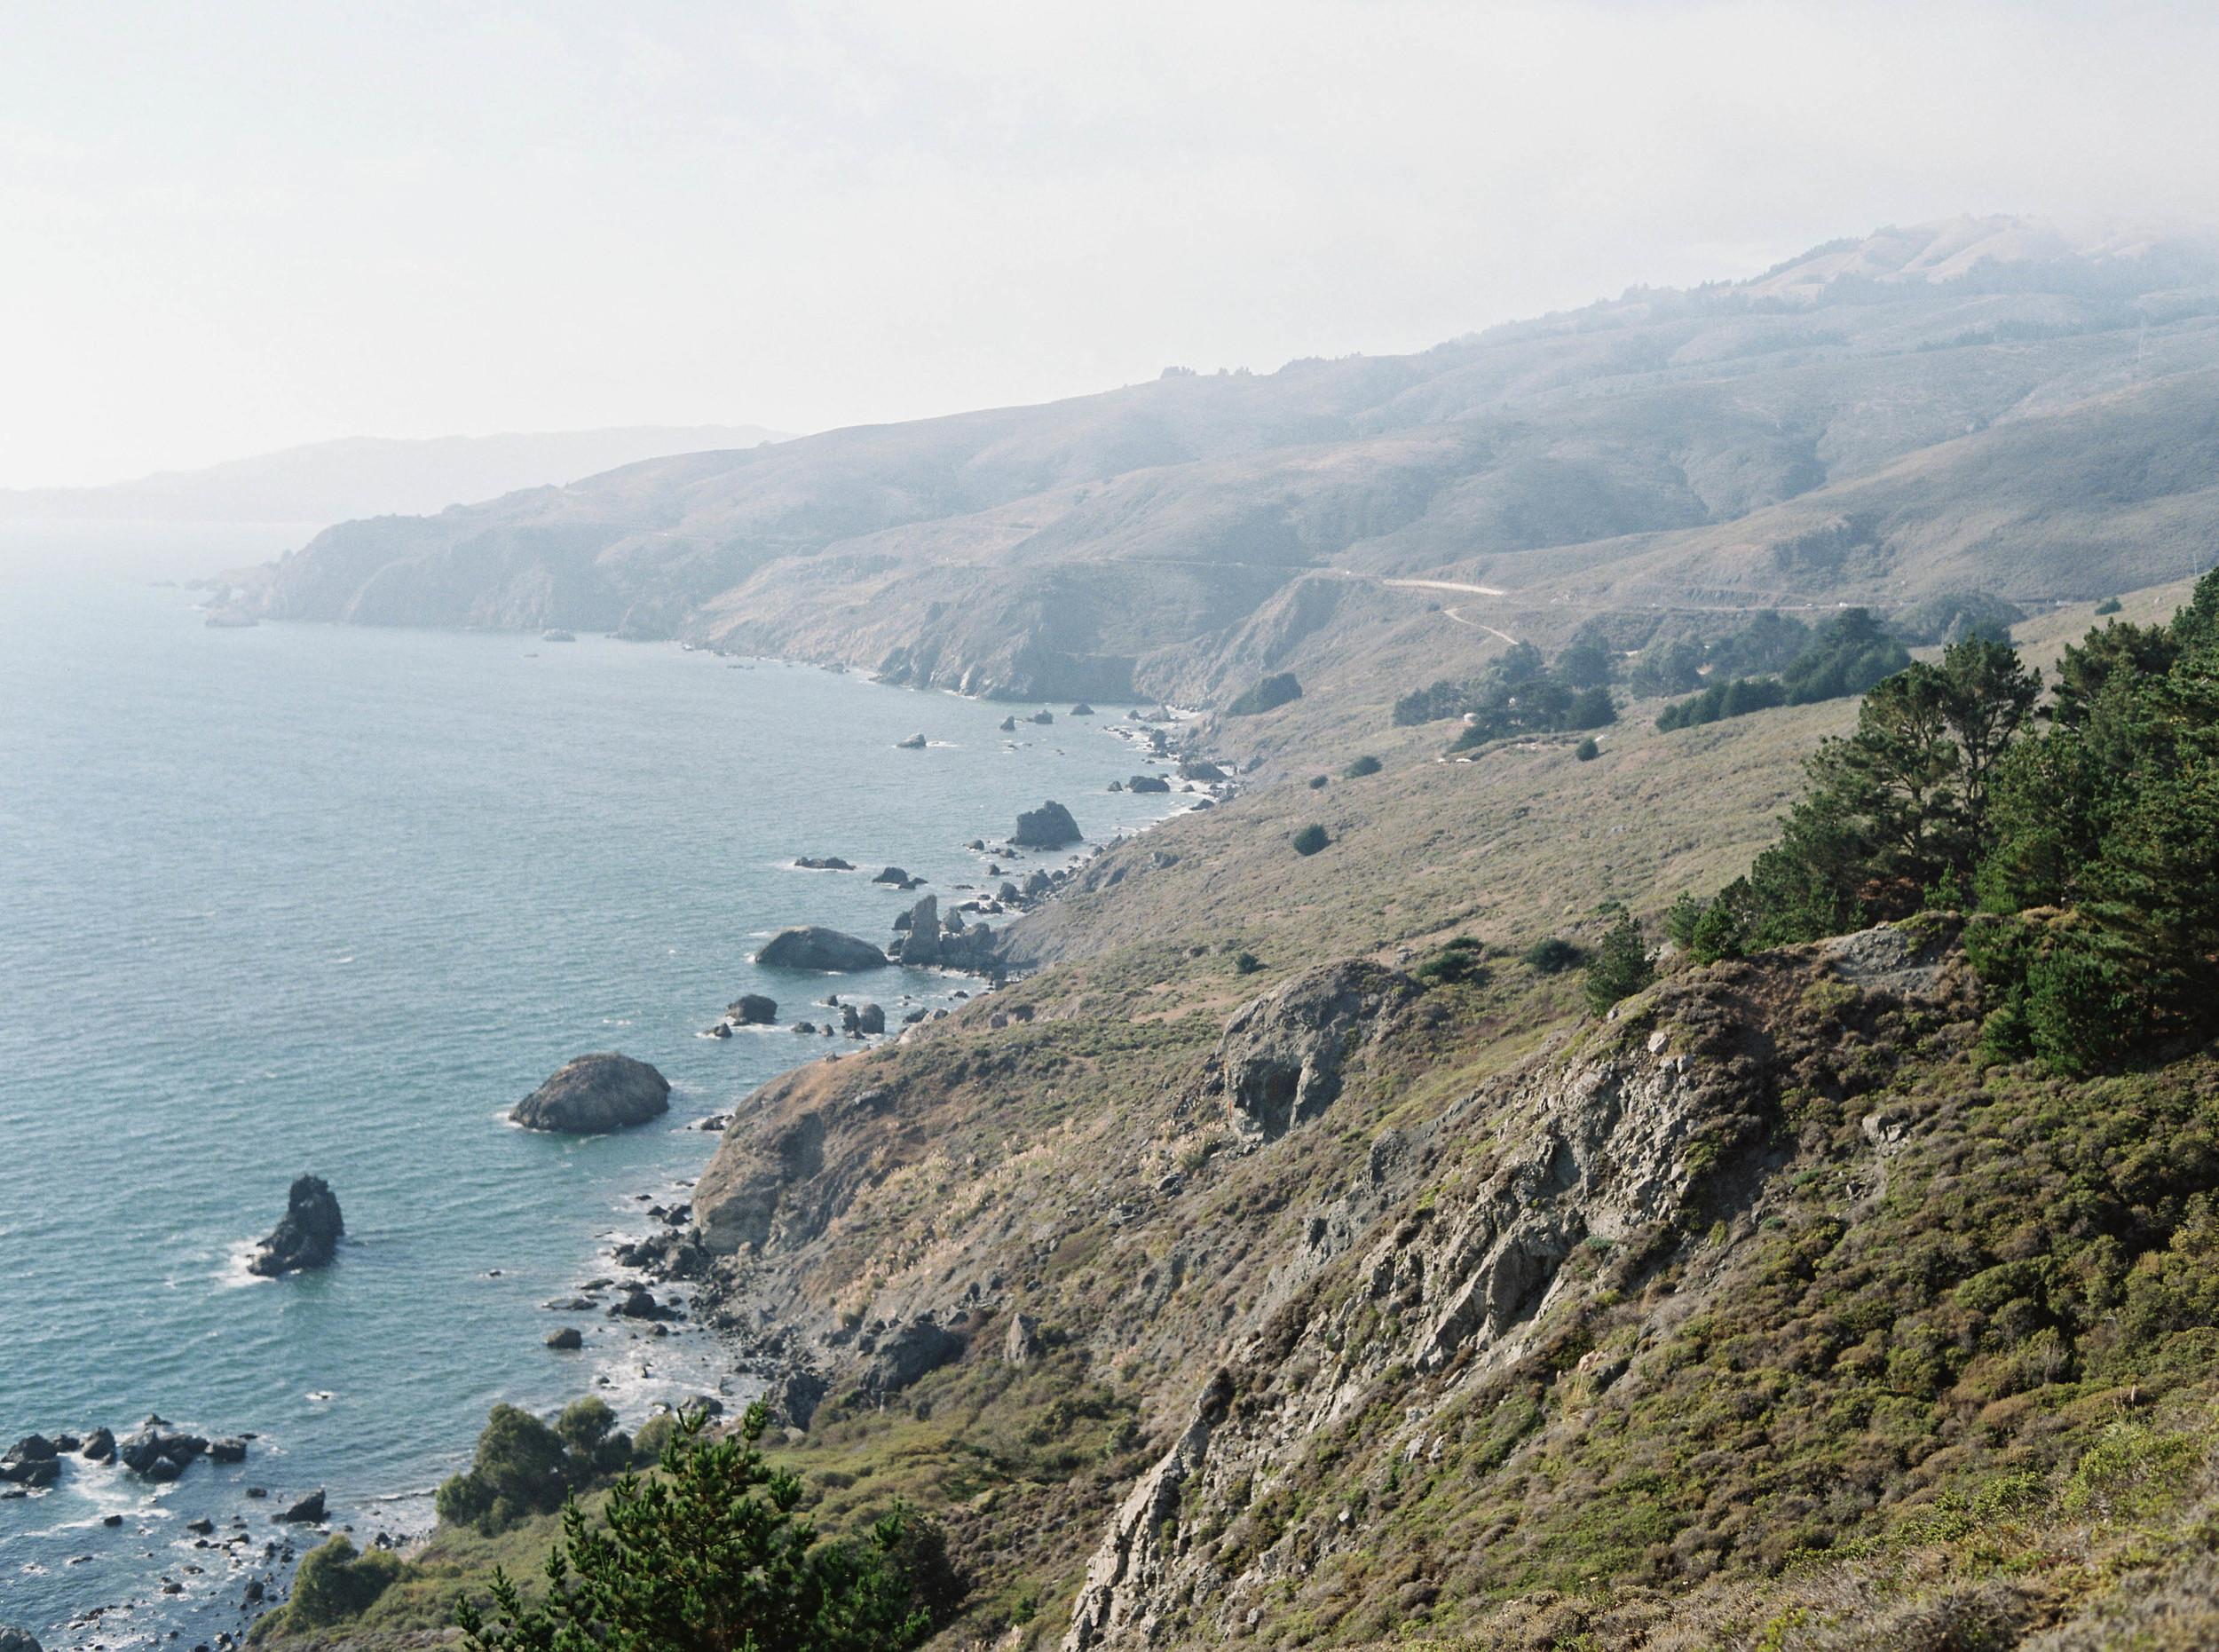 Meghan Mehan Photography - Fine Art Film Wedding Photography - San Francisco | Napa | Sonoma | Big Sur | Santa Barbara - 017.jpg